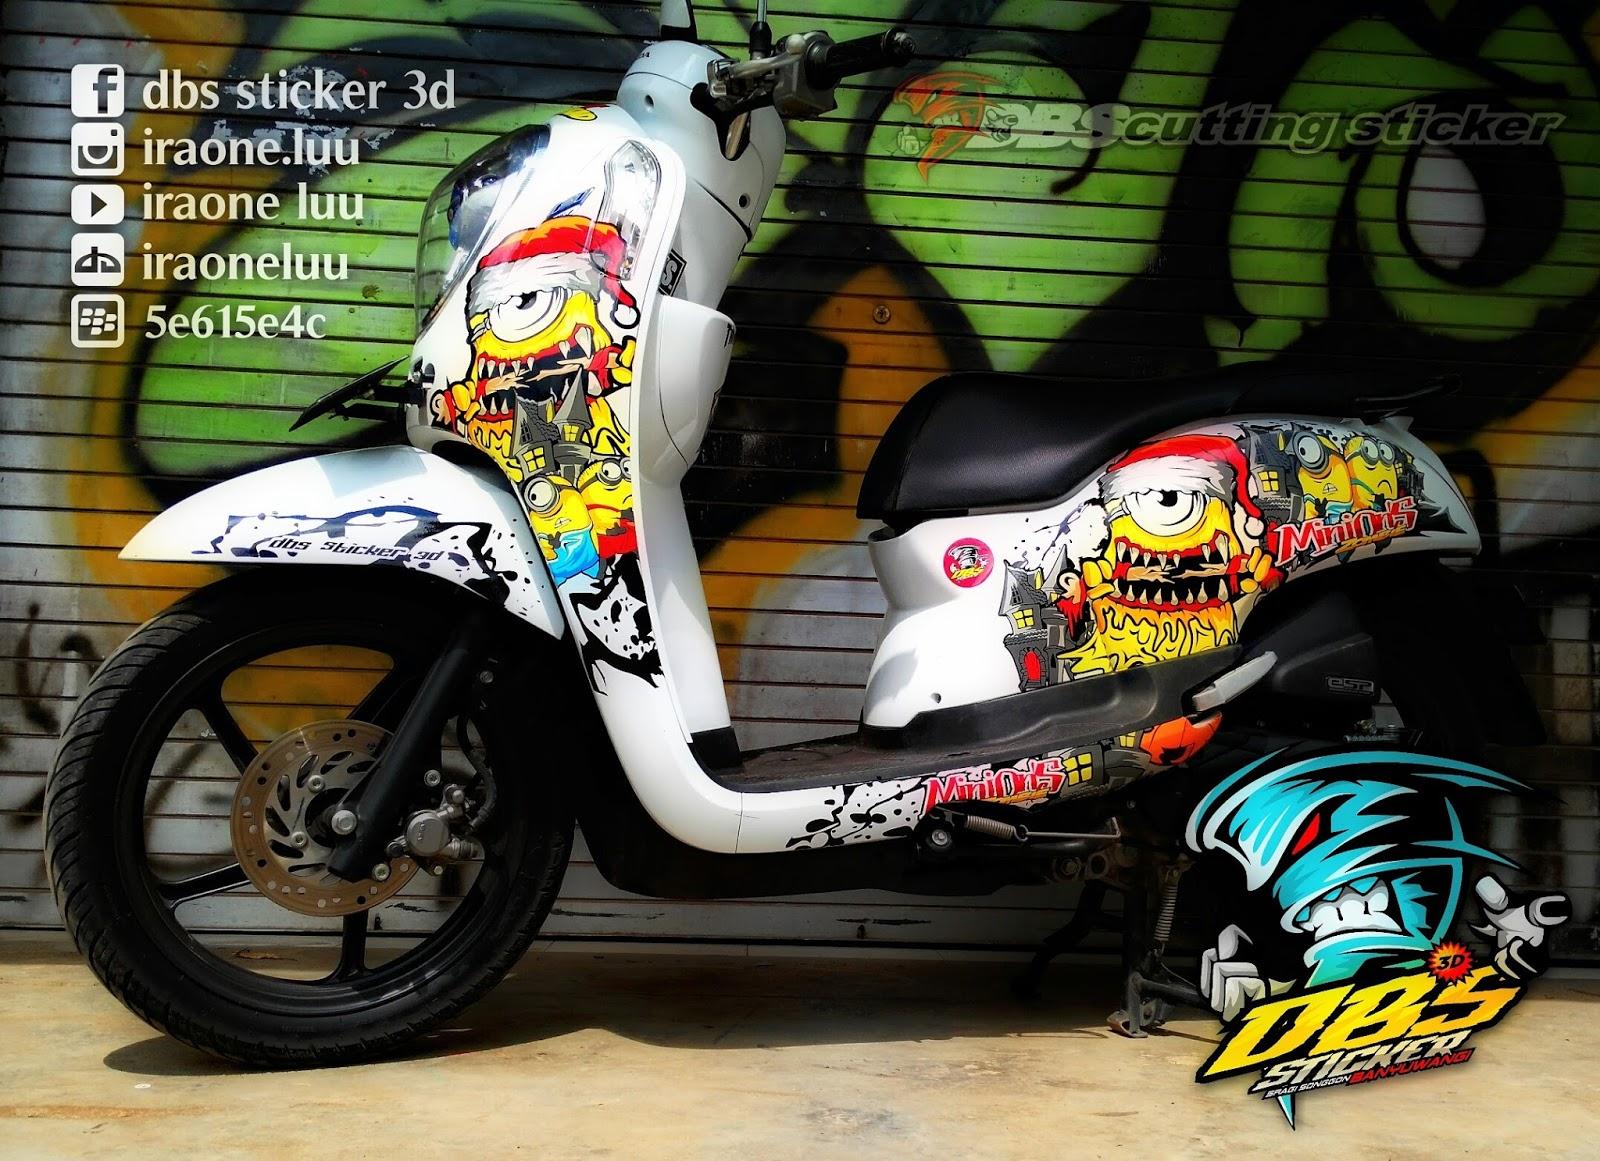 Gambar Cutting Sticker Motor Vespa Jakarta Modif Sticker